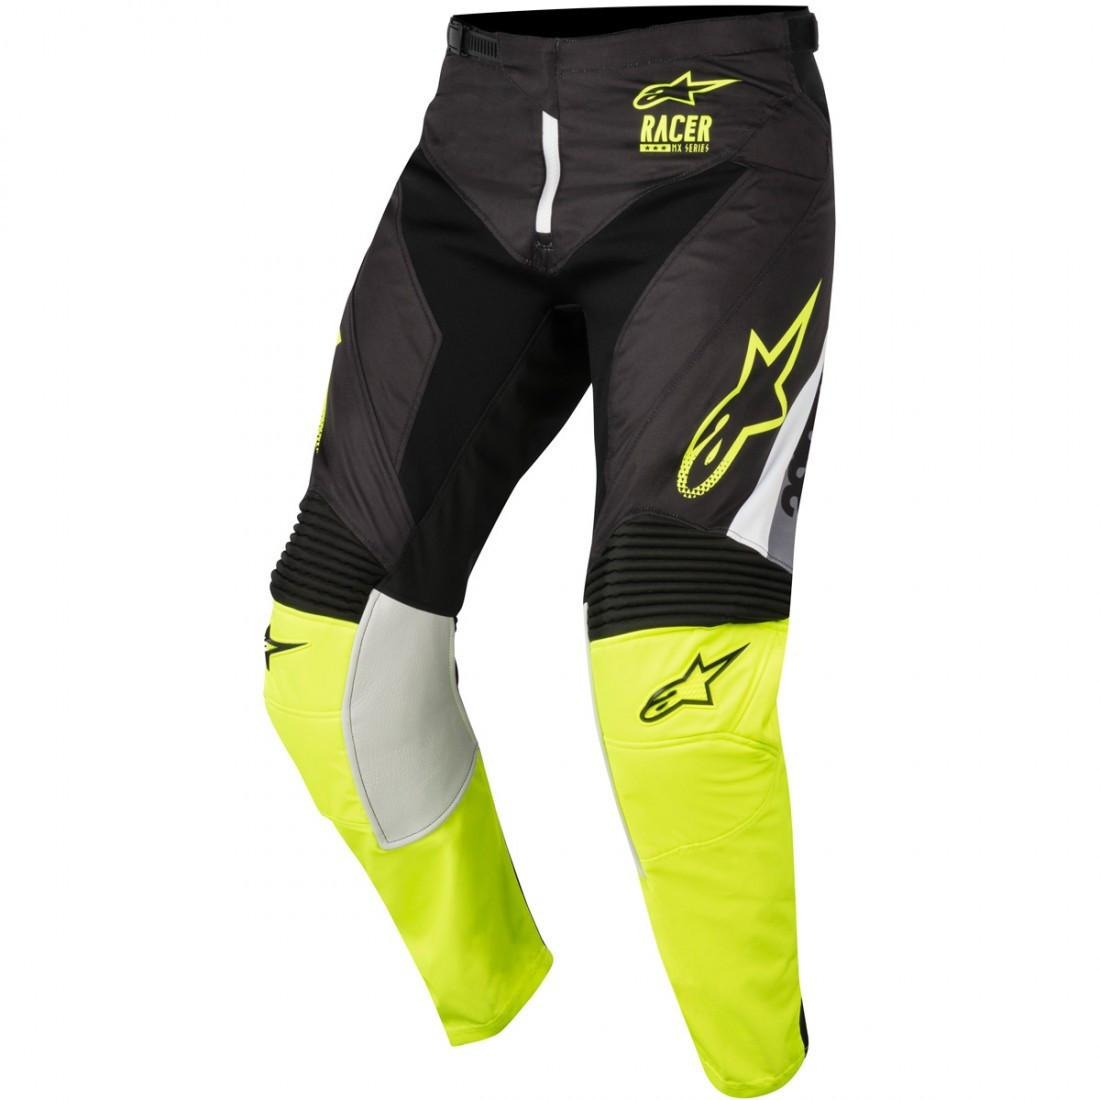 "Брюки Alpinestars Racer Supermatic текстиль черно-желтые ""M"" (32)"